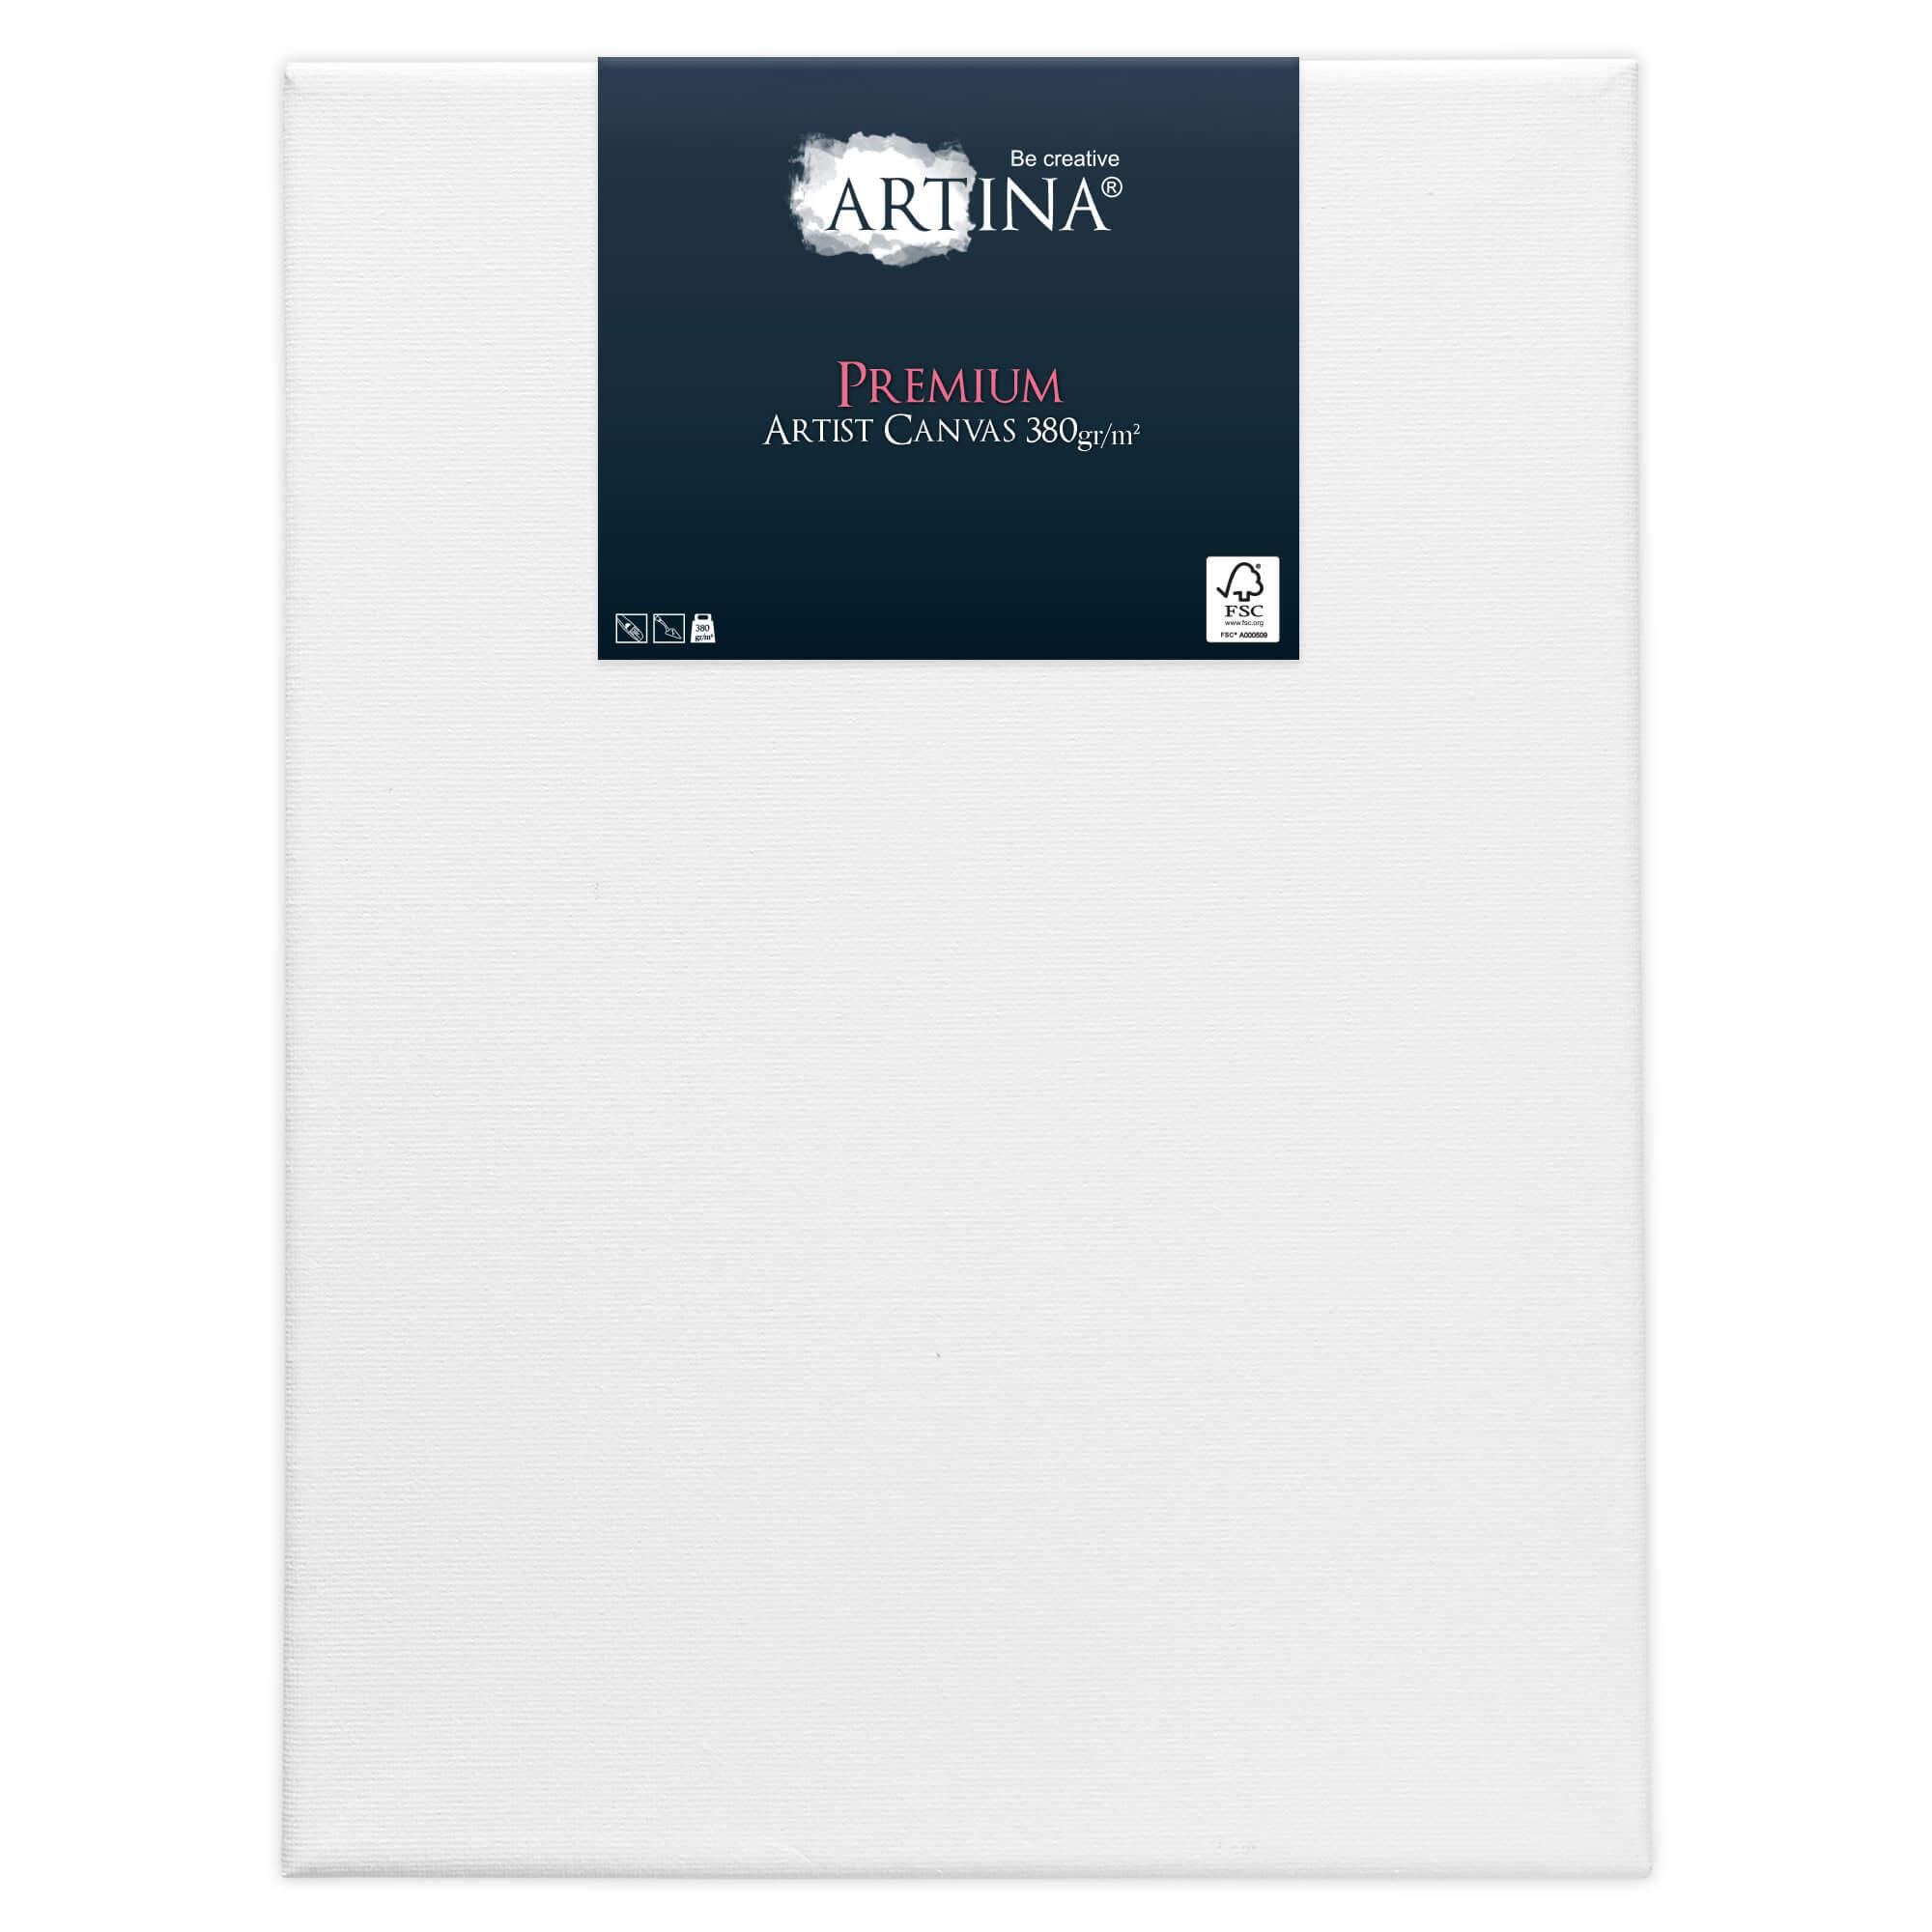 2er Set Artina Premium 380g/m² Leinwand auf Keilrahmen - 15x20 cm